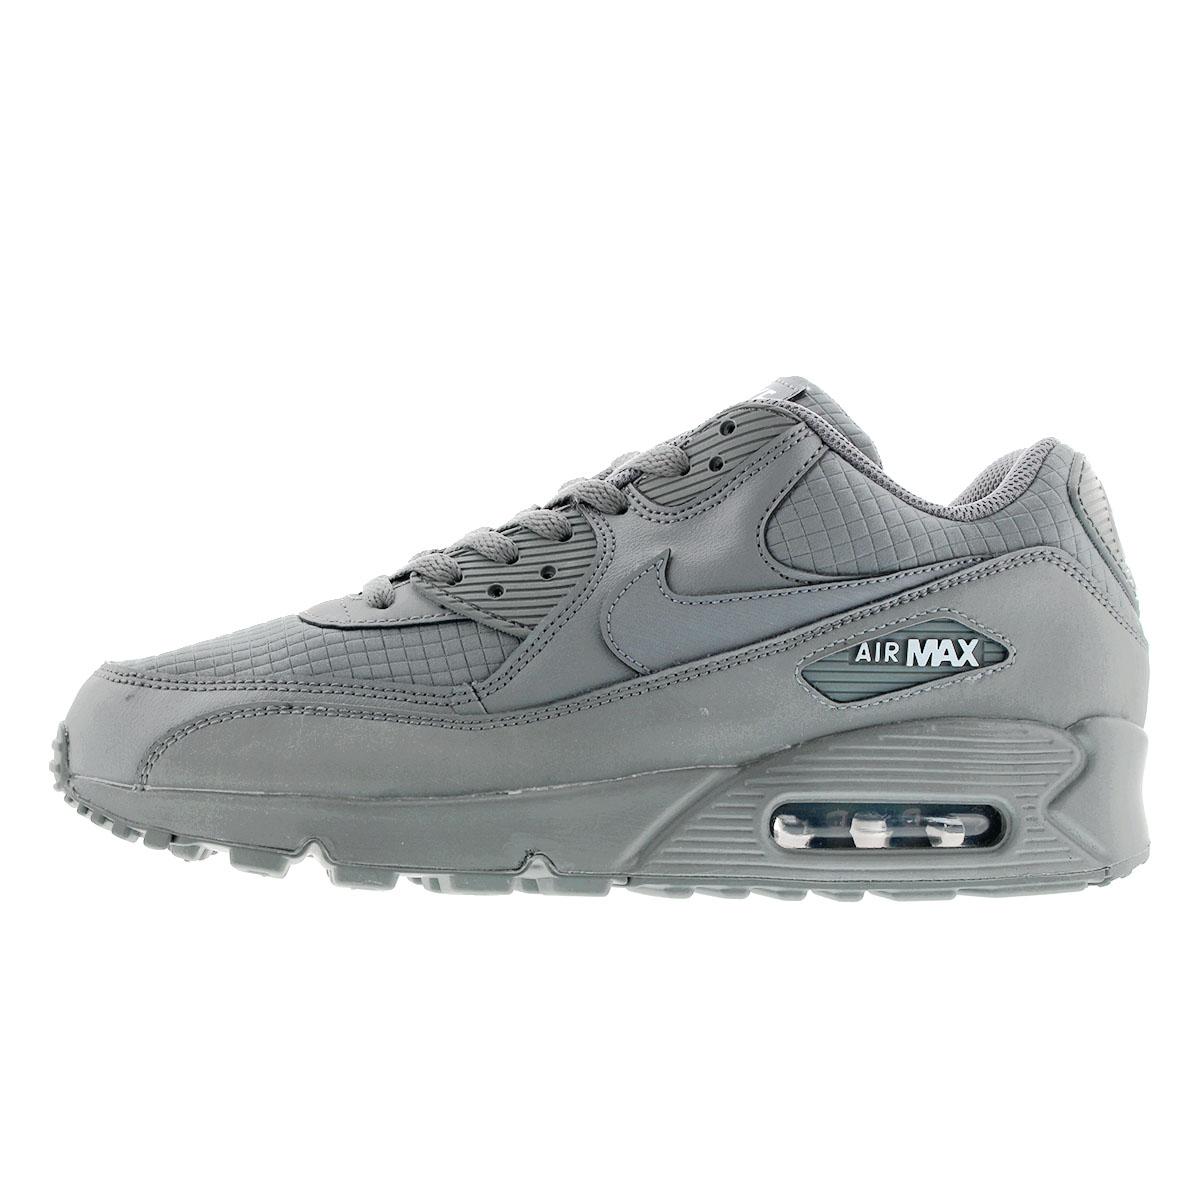 Nike Air Max 90 Essential Aj1285 102 Sneakersnstuff I